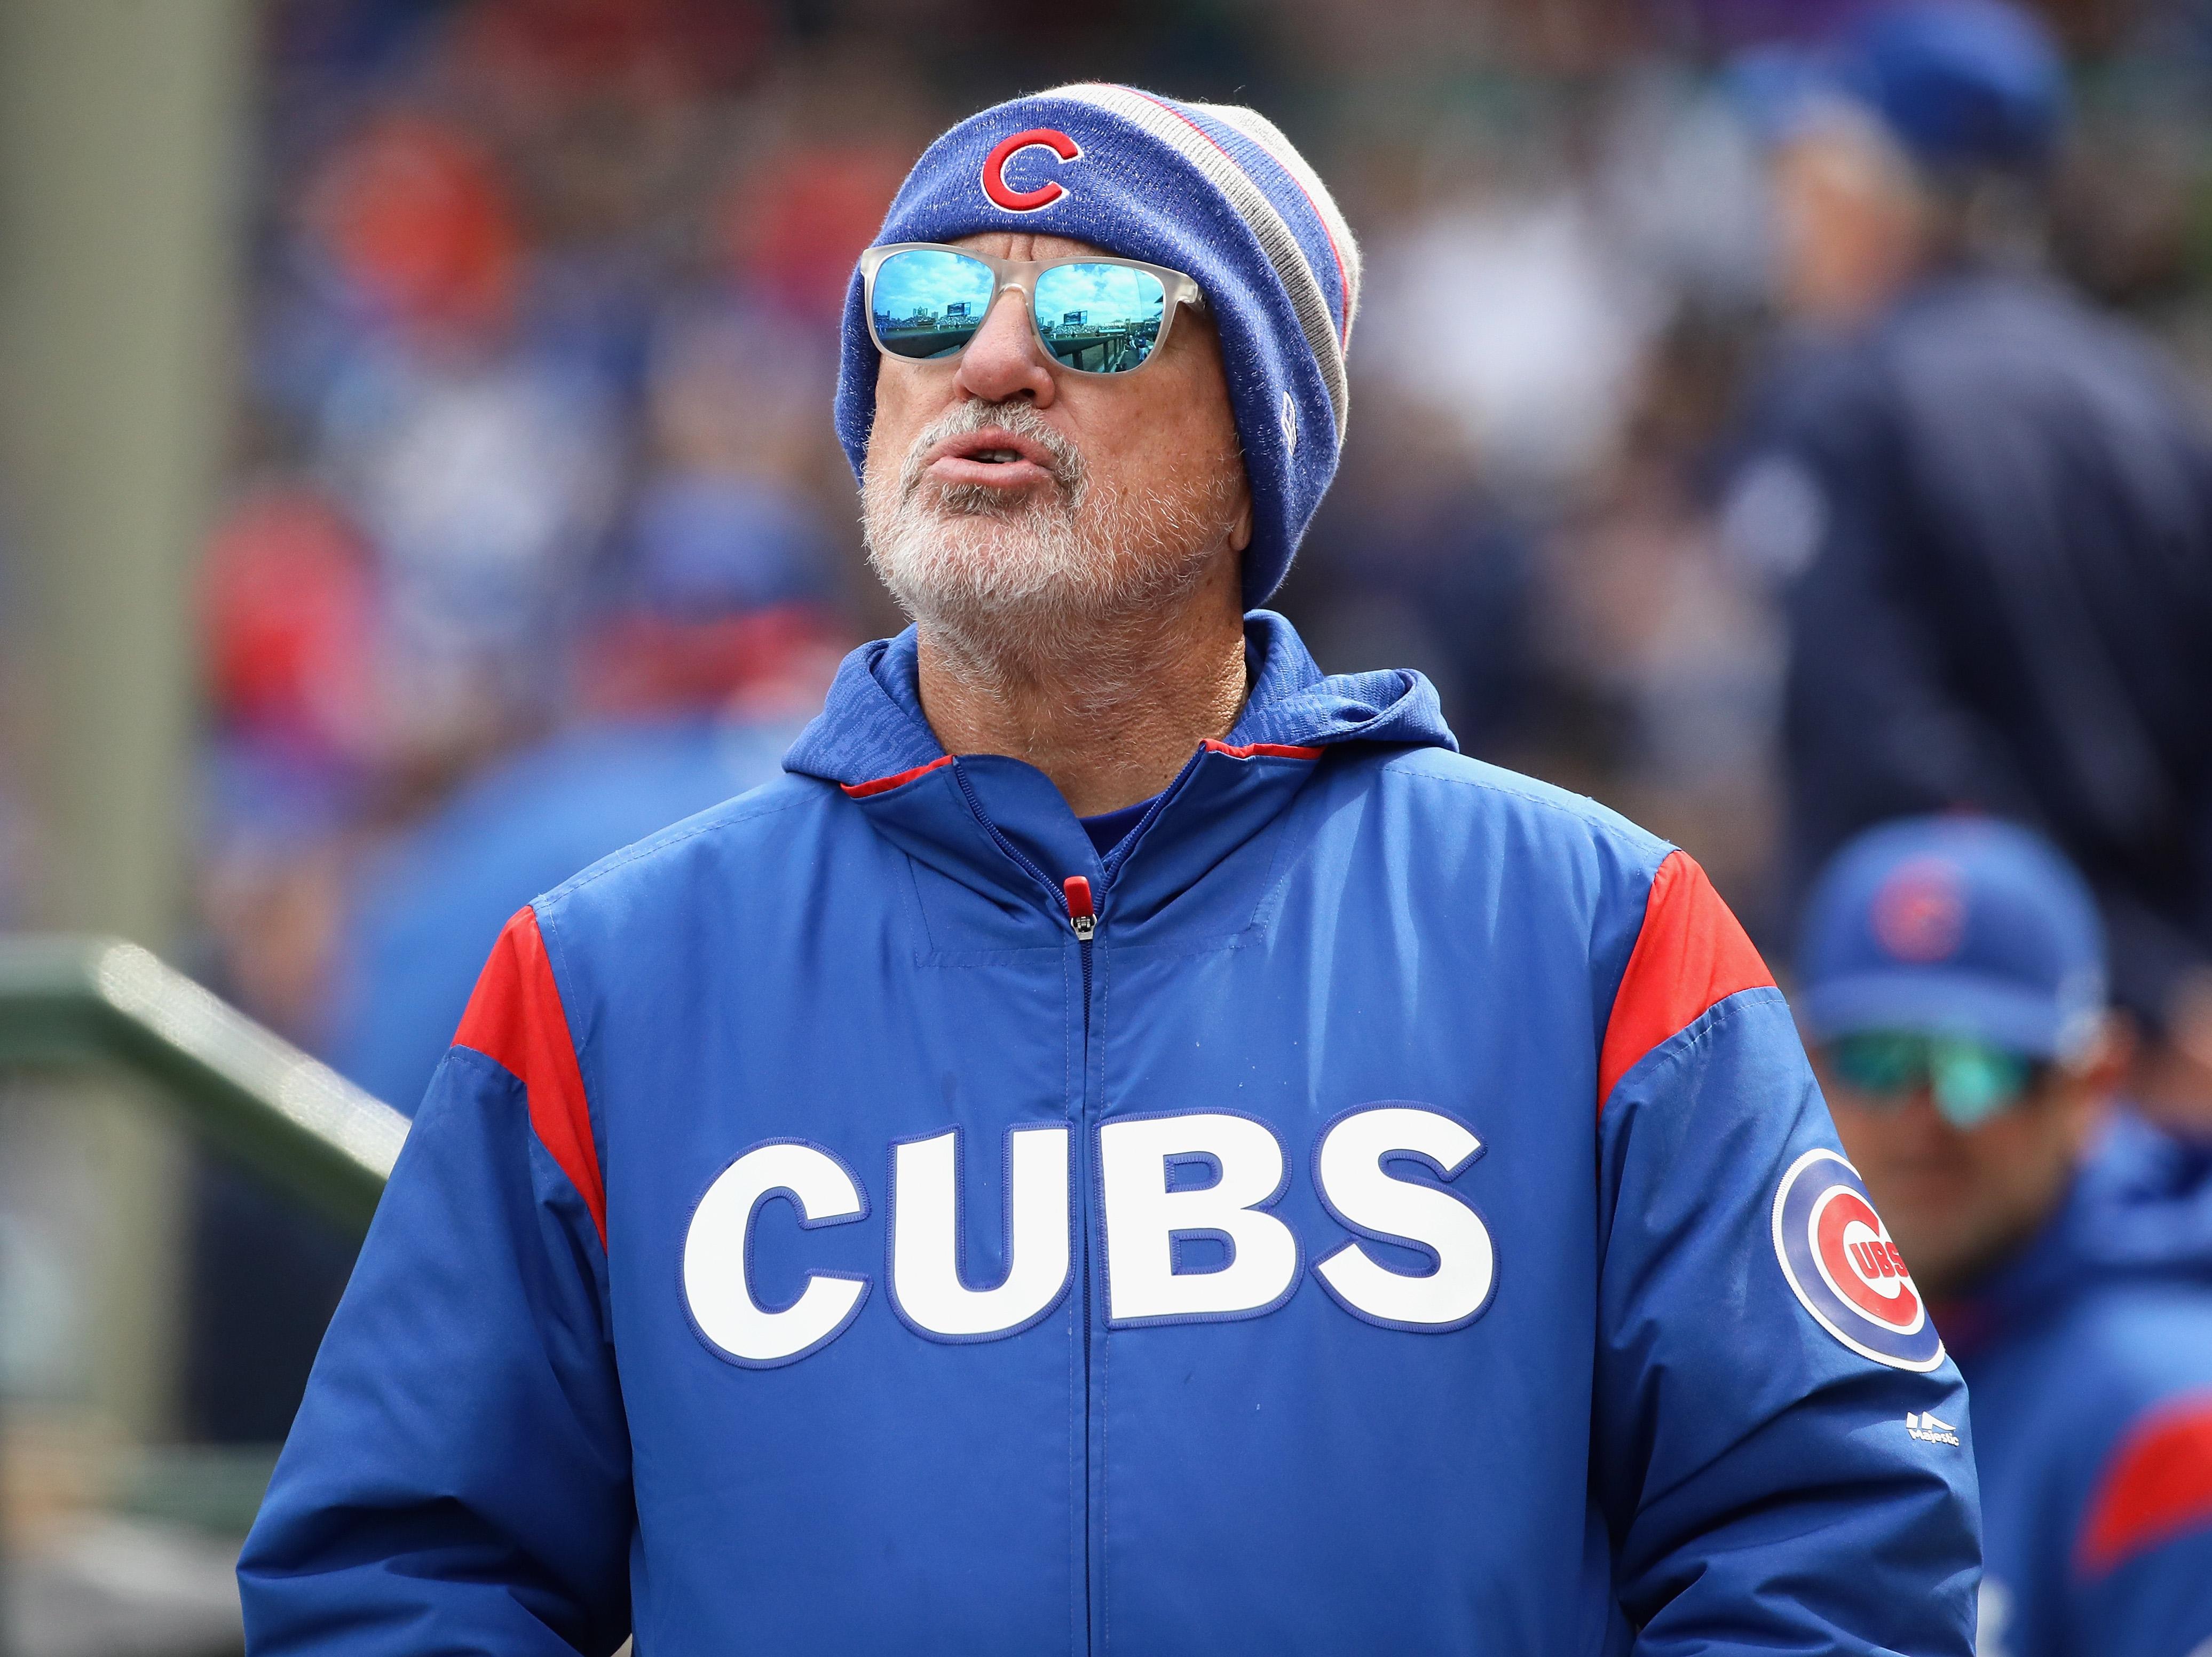 Former Cubs manager Joe Maddon